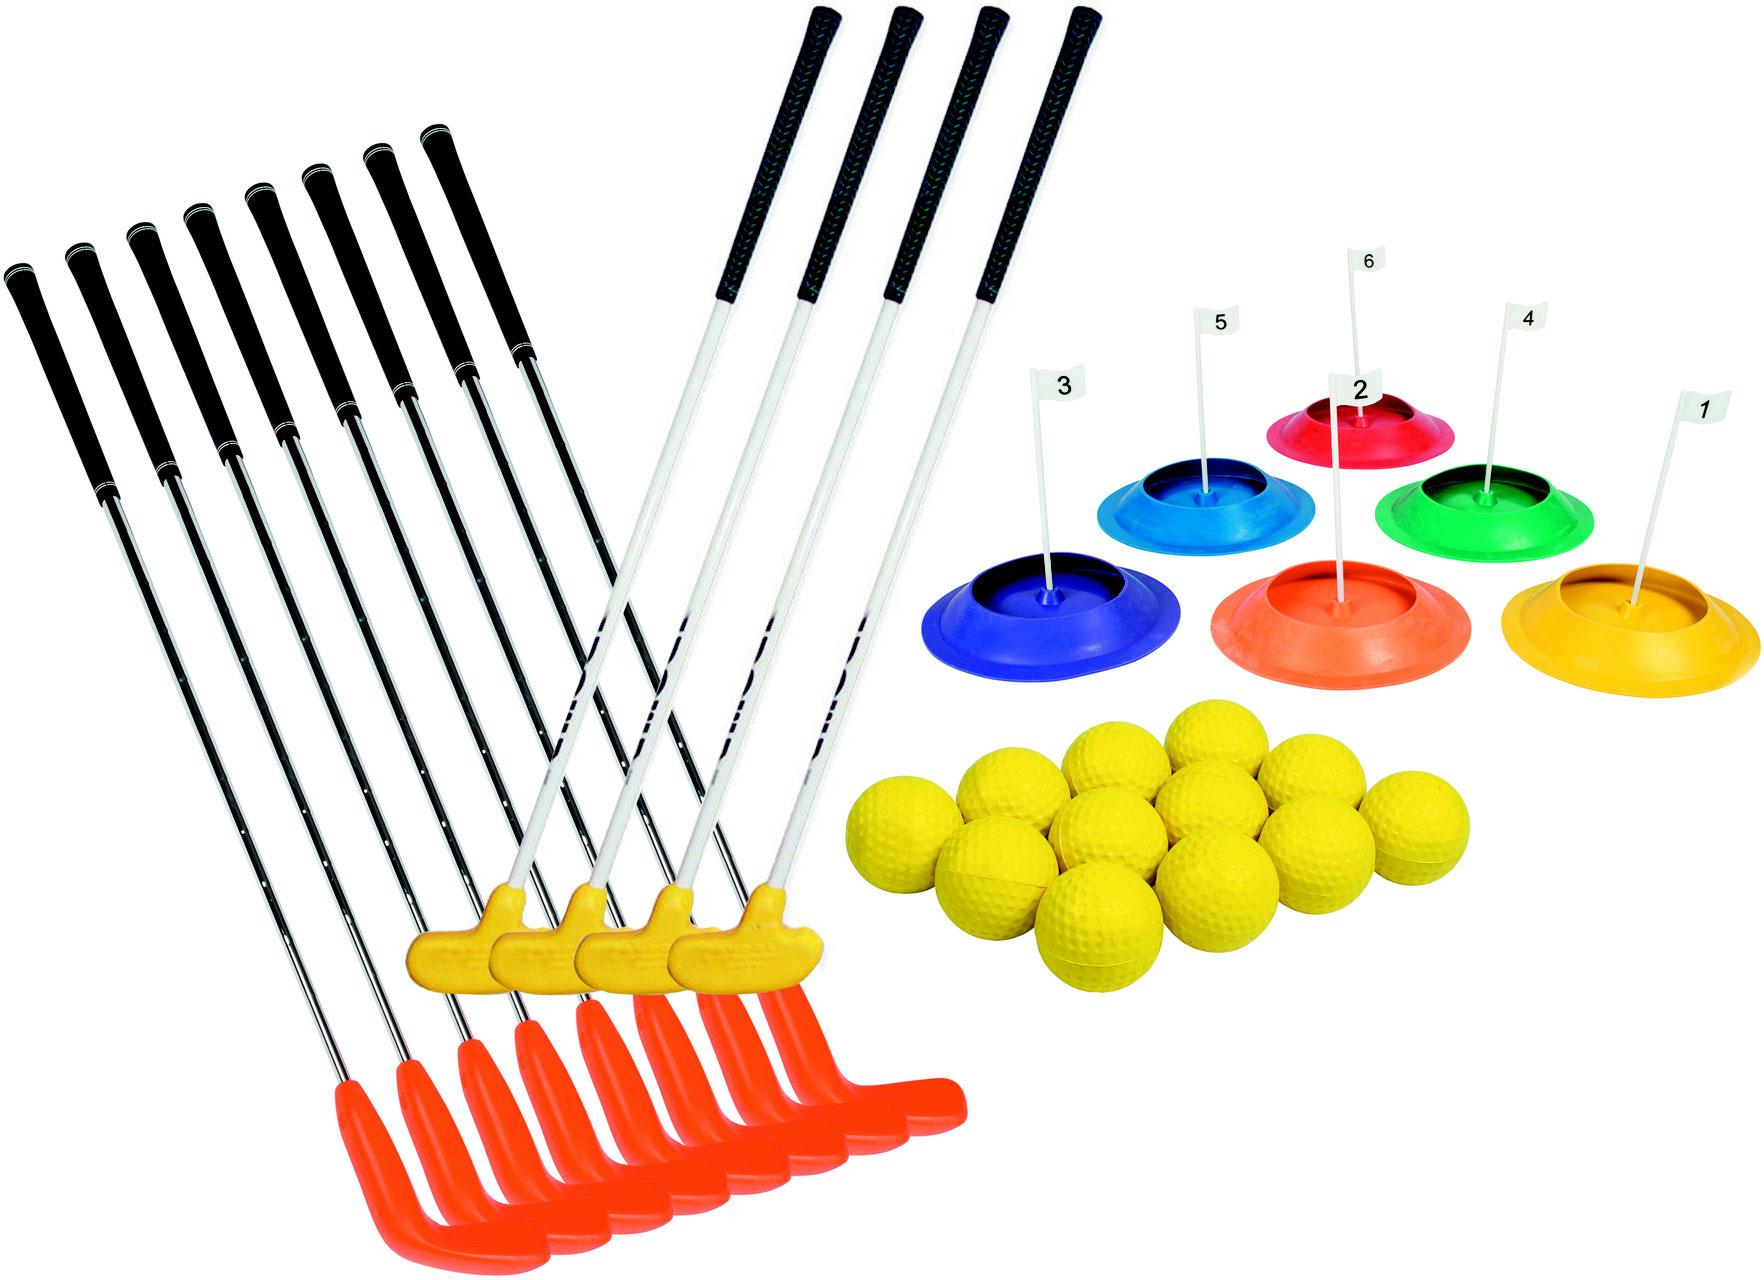 kit de jeu de golf mat riel sportif et p dagogique. Black Bedroom Furniture Sets. Home Design Ideas